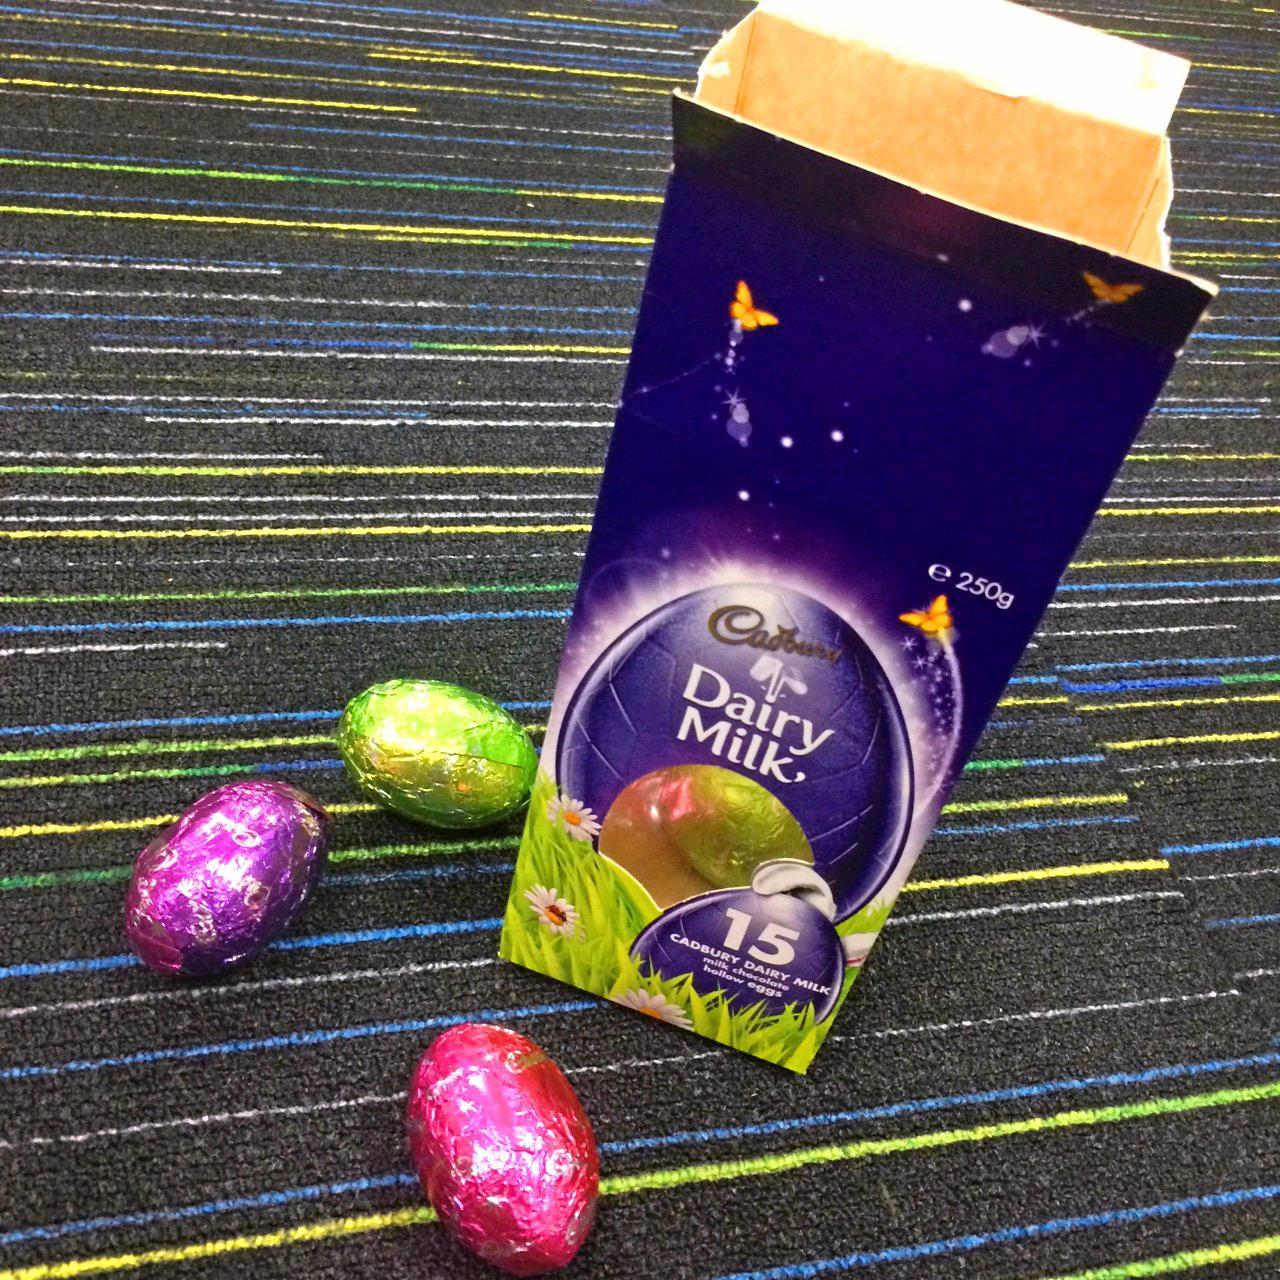 Cadbury Dairy Milk easter eggs.  Photo Contributed